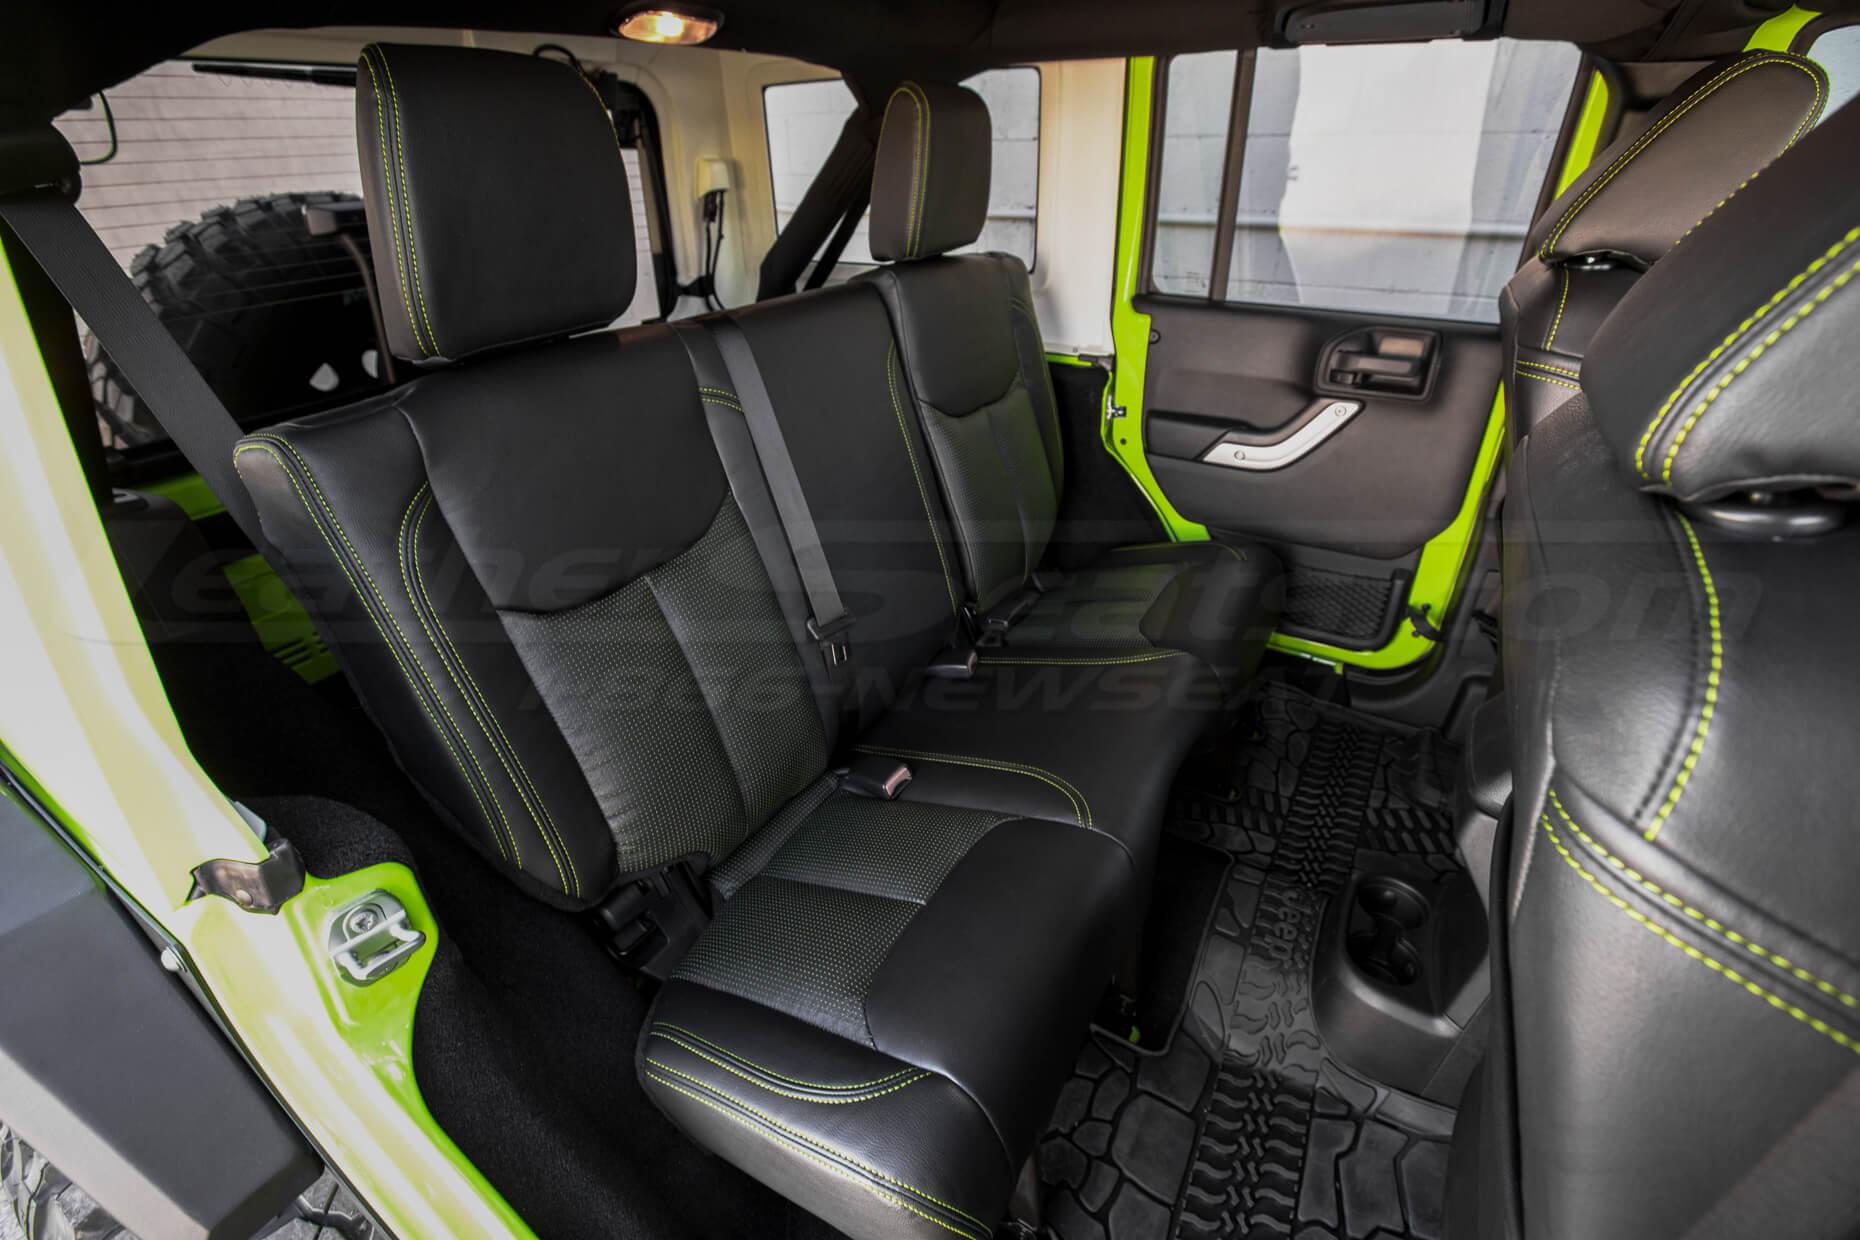 2013-2018 Jeep Wrangler install - Black & Piazza Green